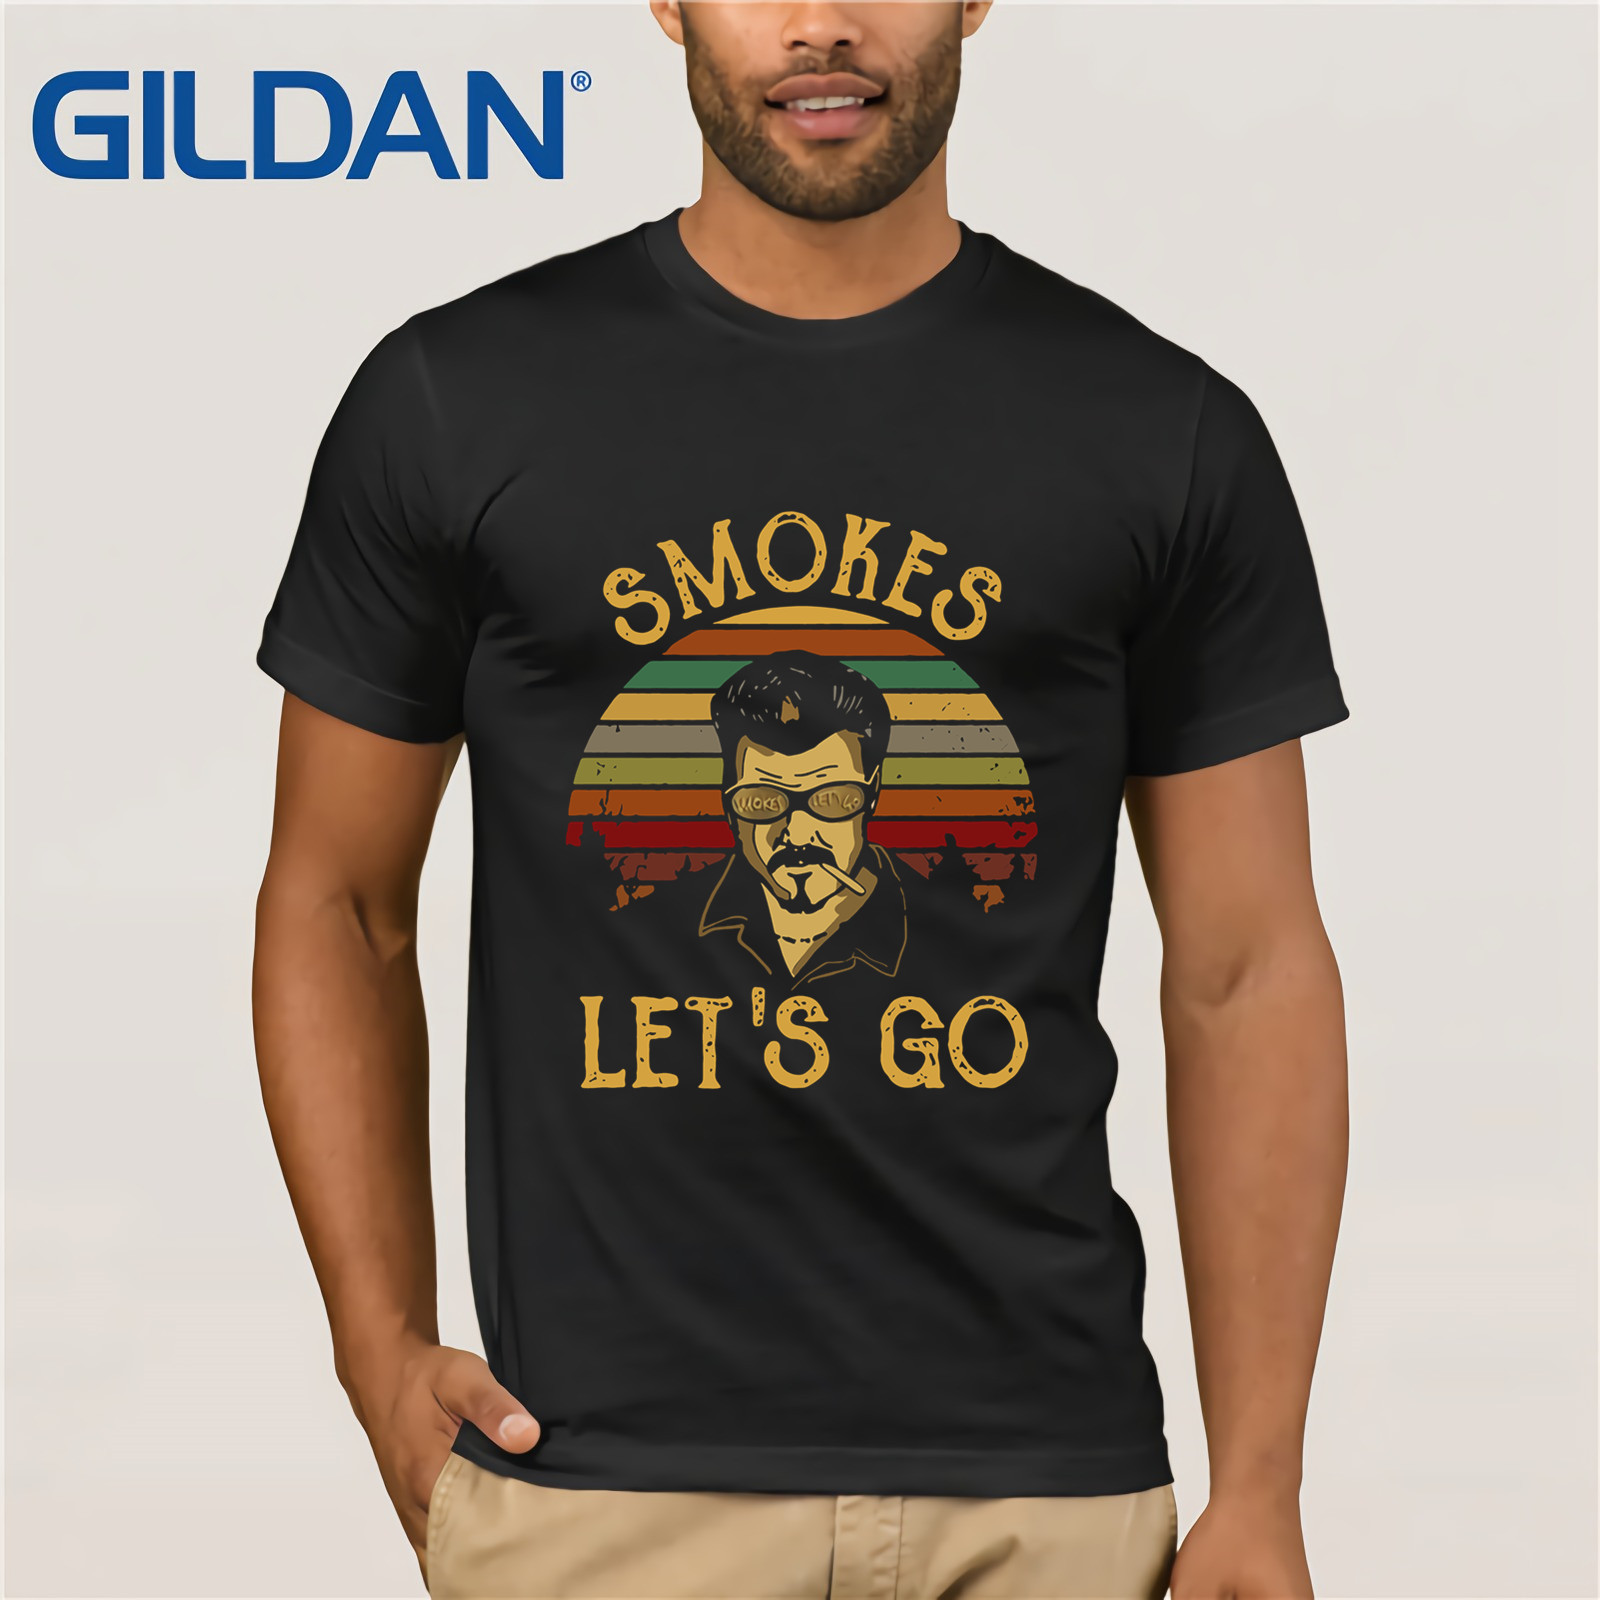 Trailer Park Boys Smokes Let's Go Vintage Shirt Summer Men's Short Sleeve T-Shirt For Men Tops  Funny Tees Cotton Tops T Shirt